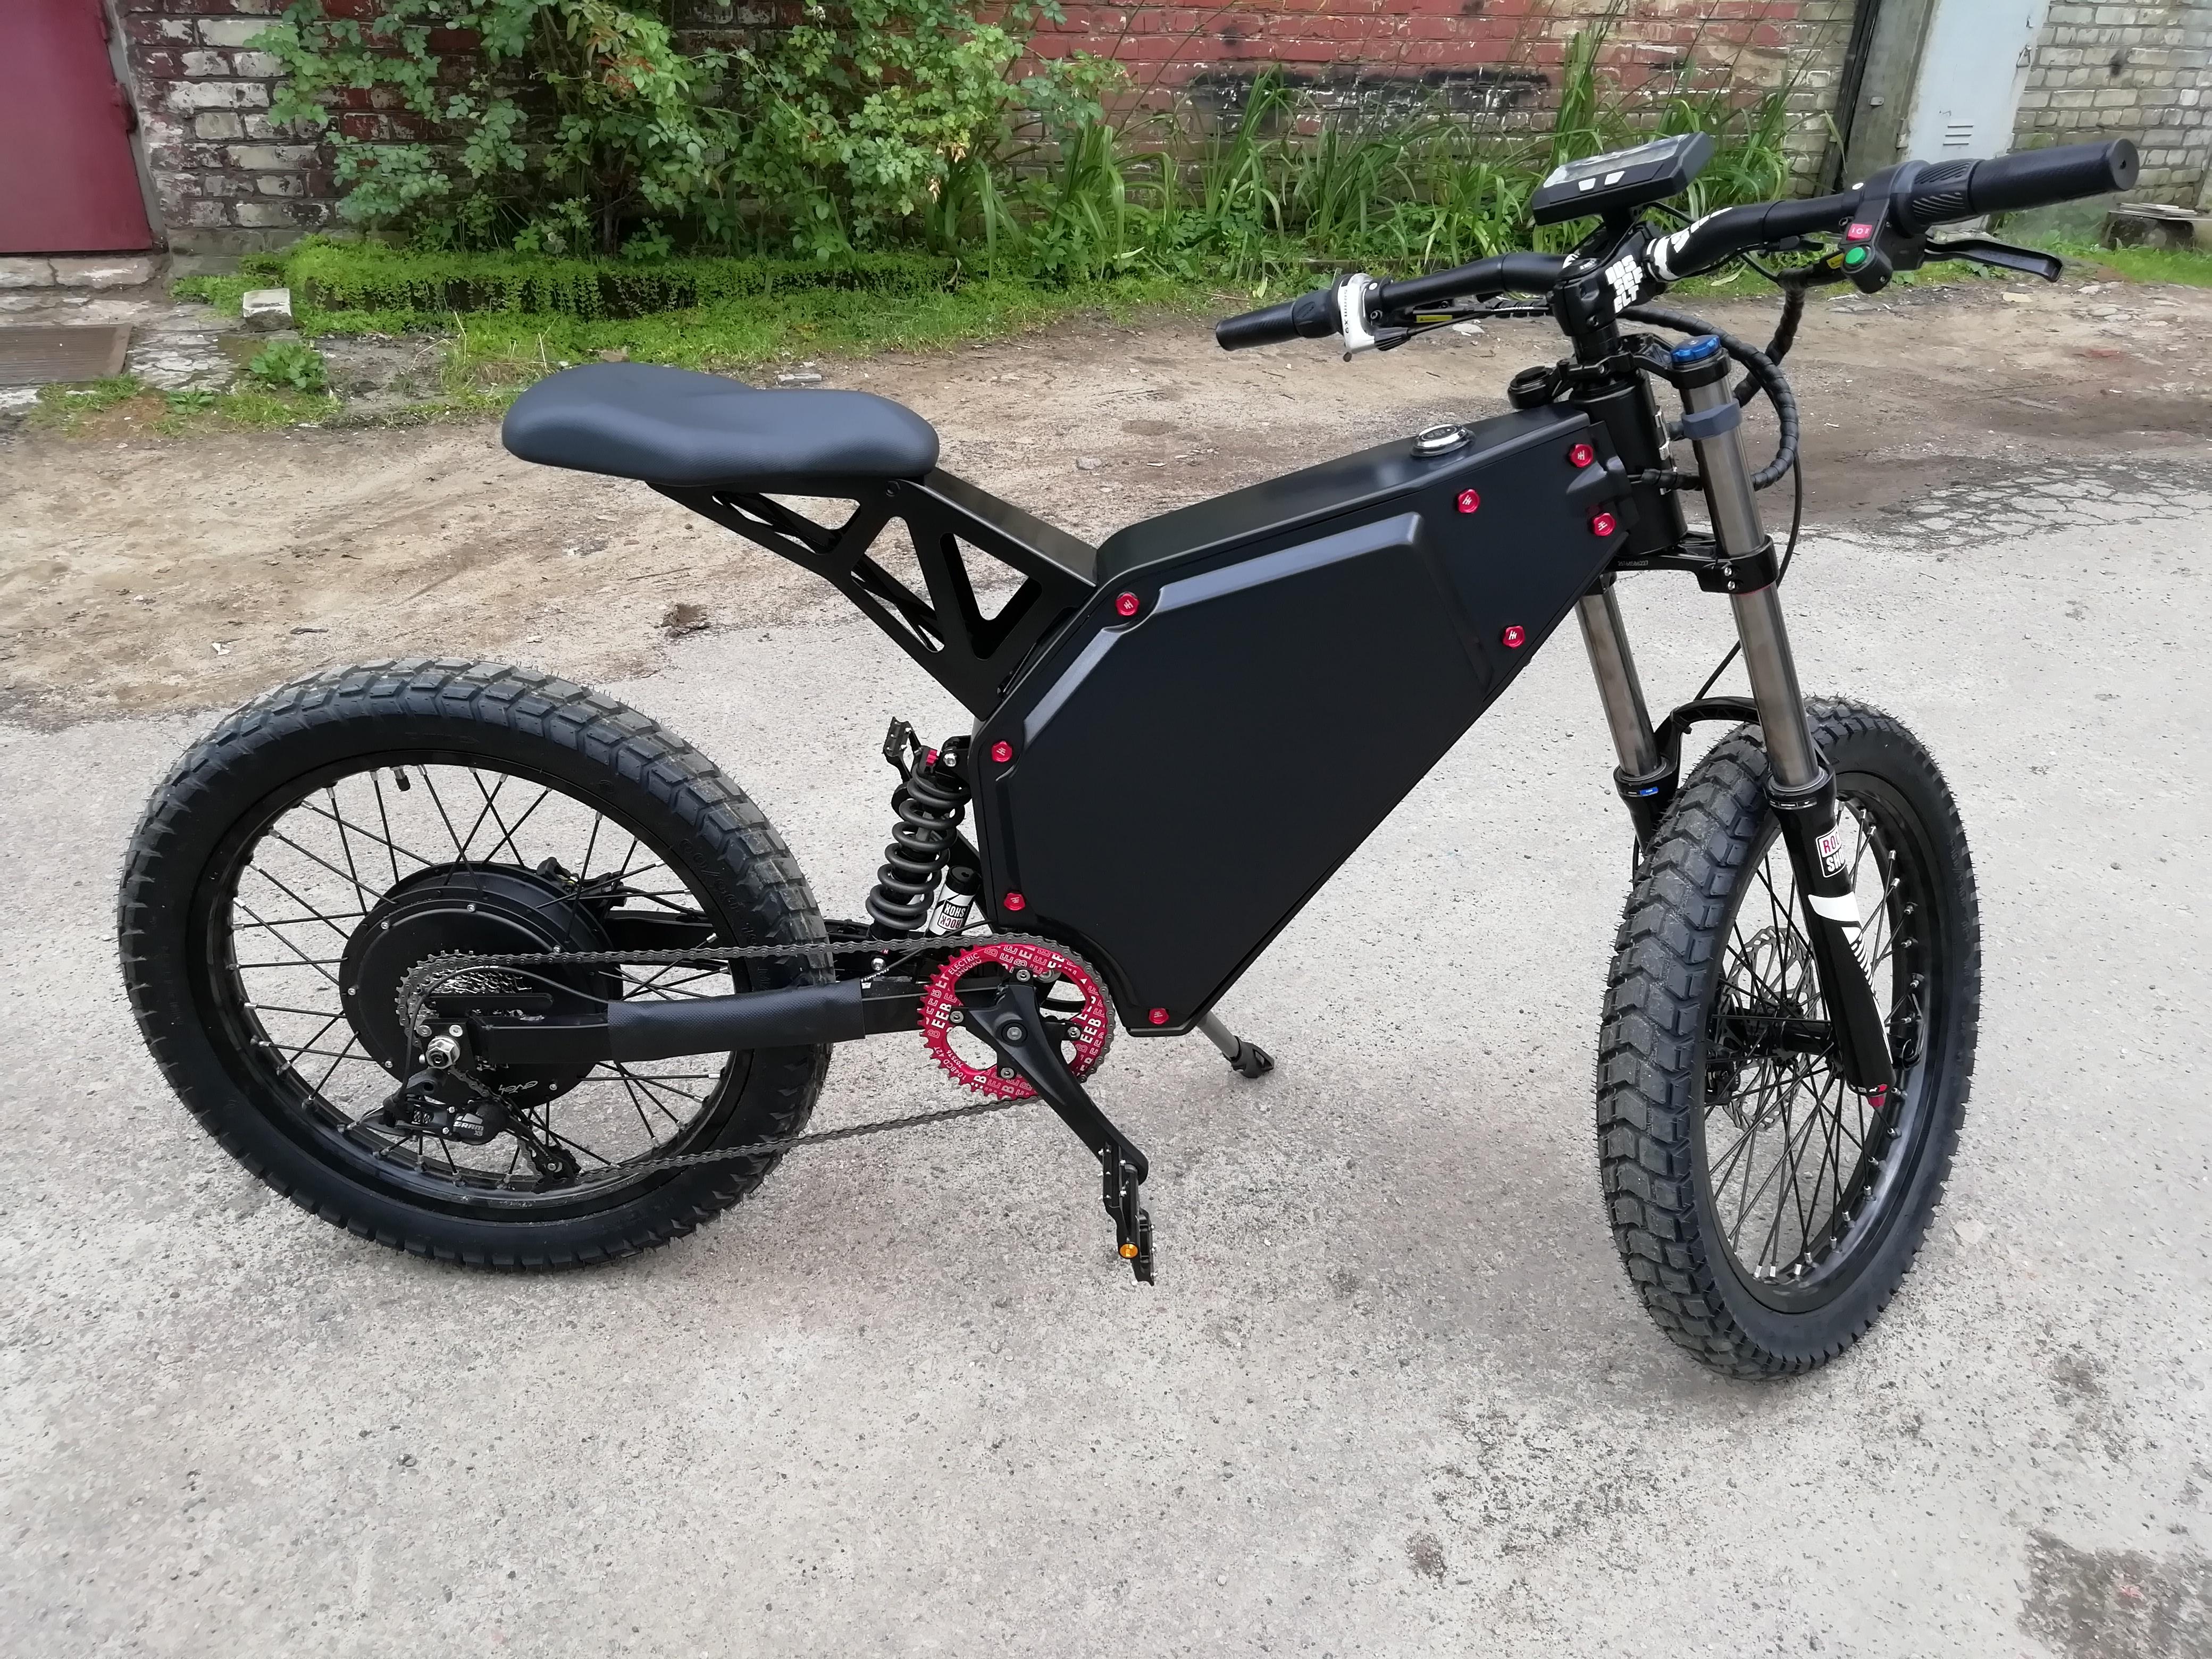 Електровелосипед обираемо правильно